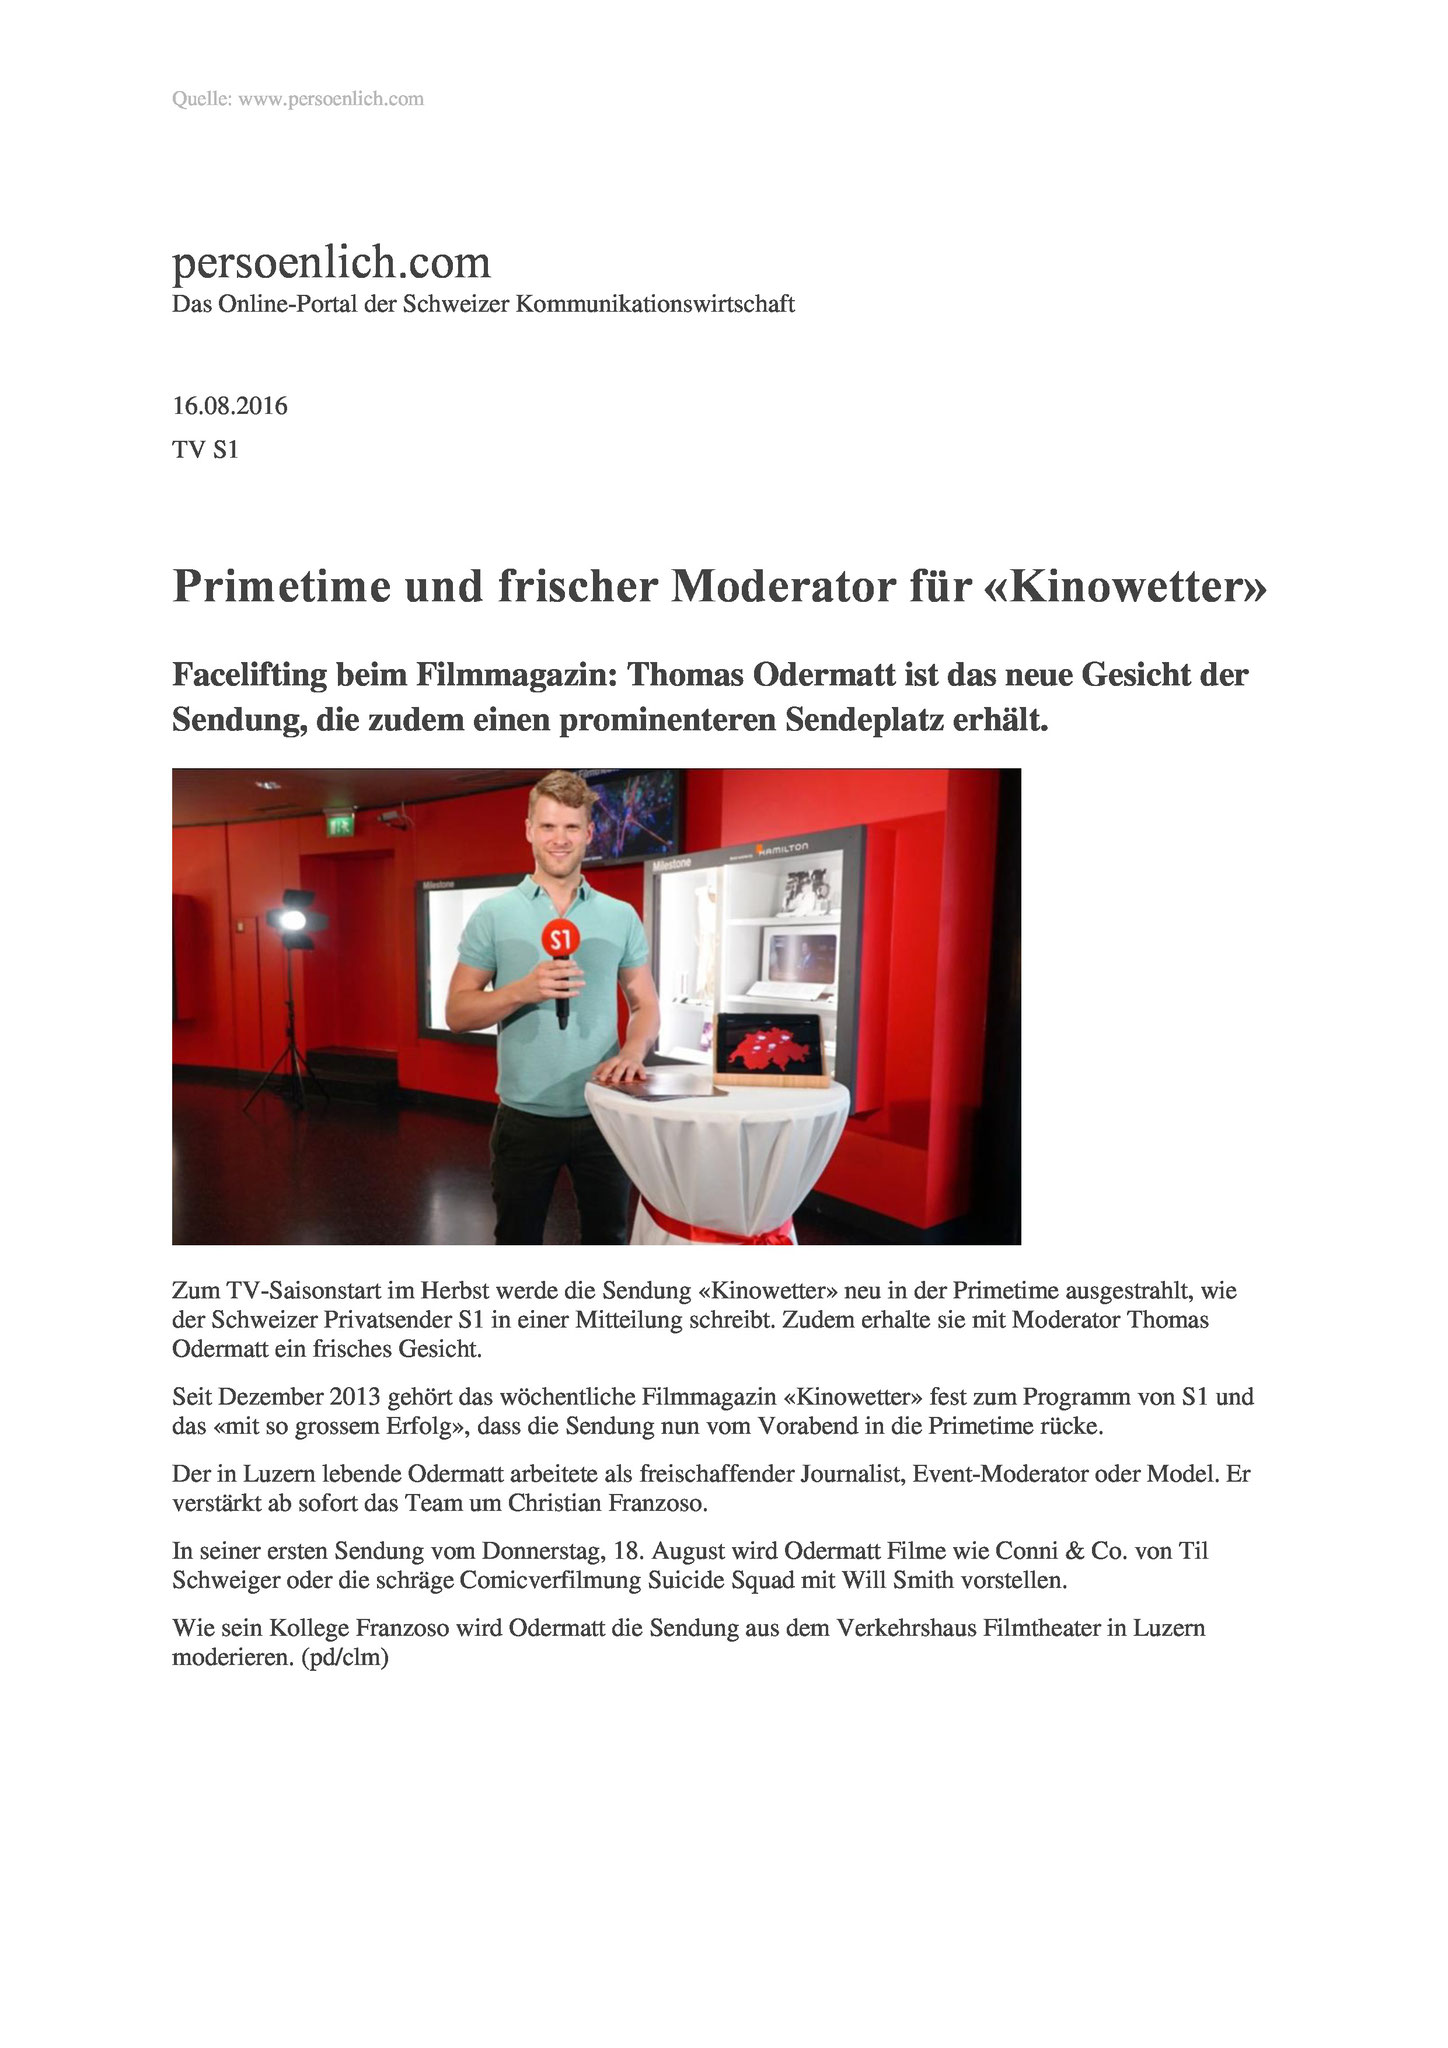 Persönlich Kinowetter Moderator Thomas Odermatt